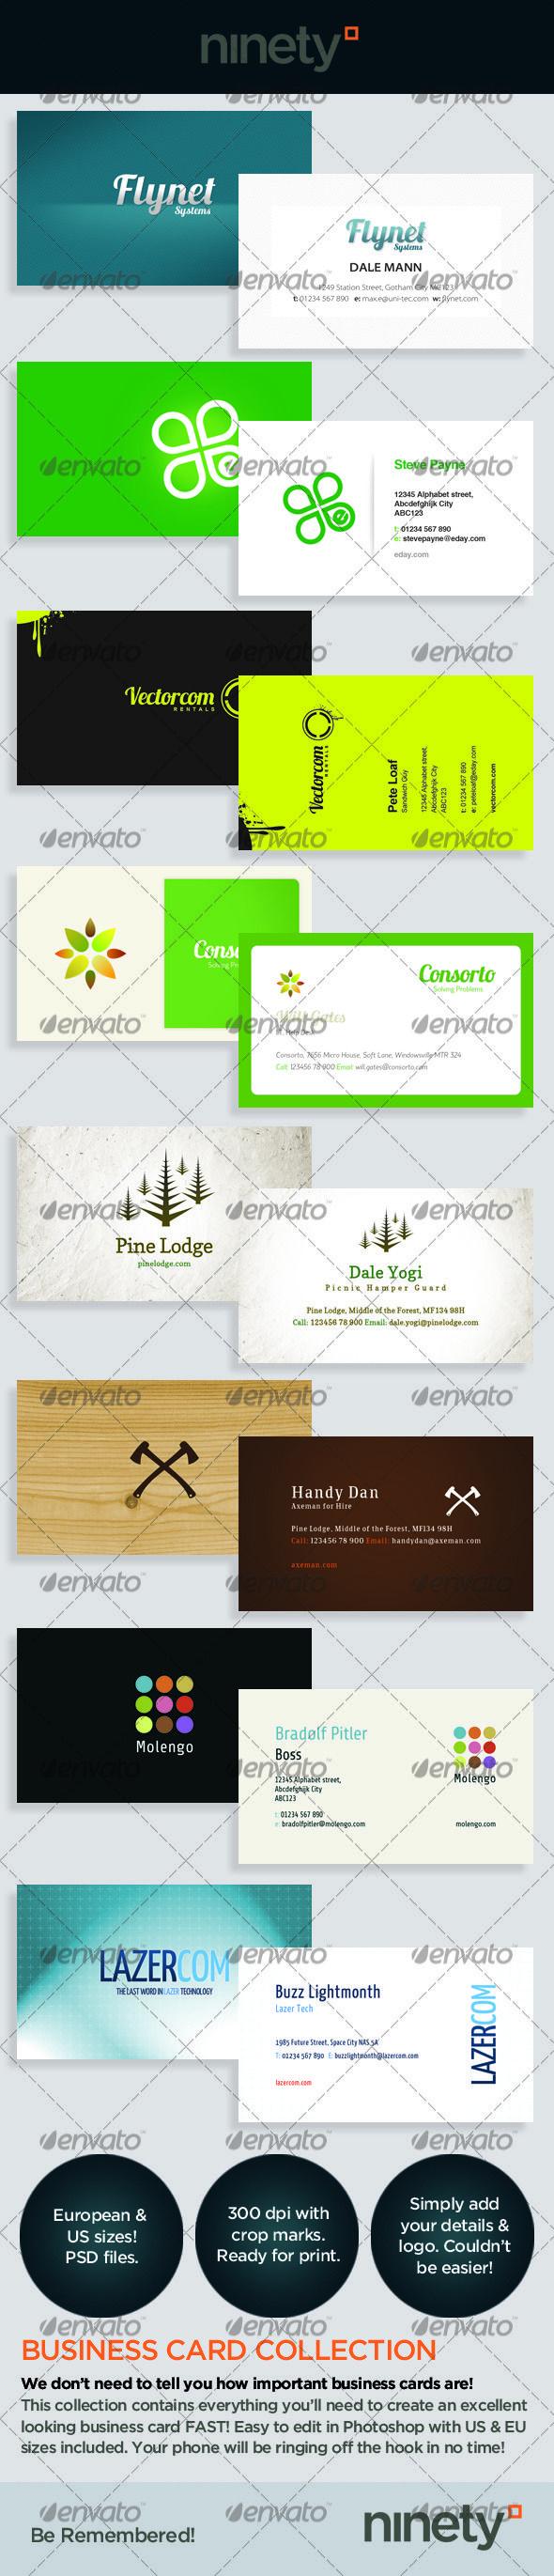 Best 25+ Free business cards uk ideas on Pinterest | Visit cards ...